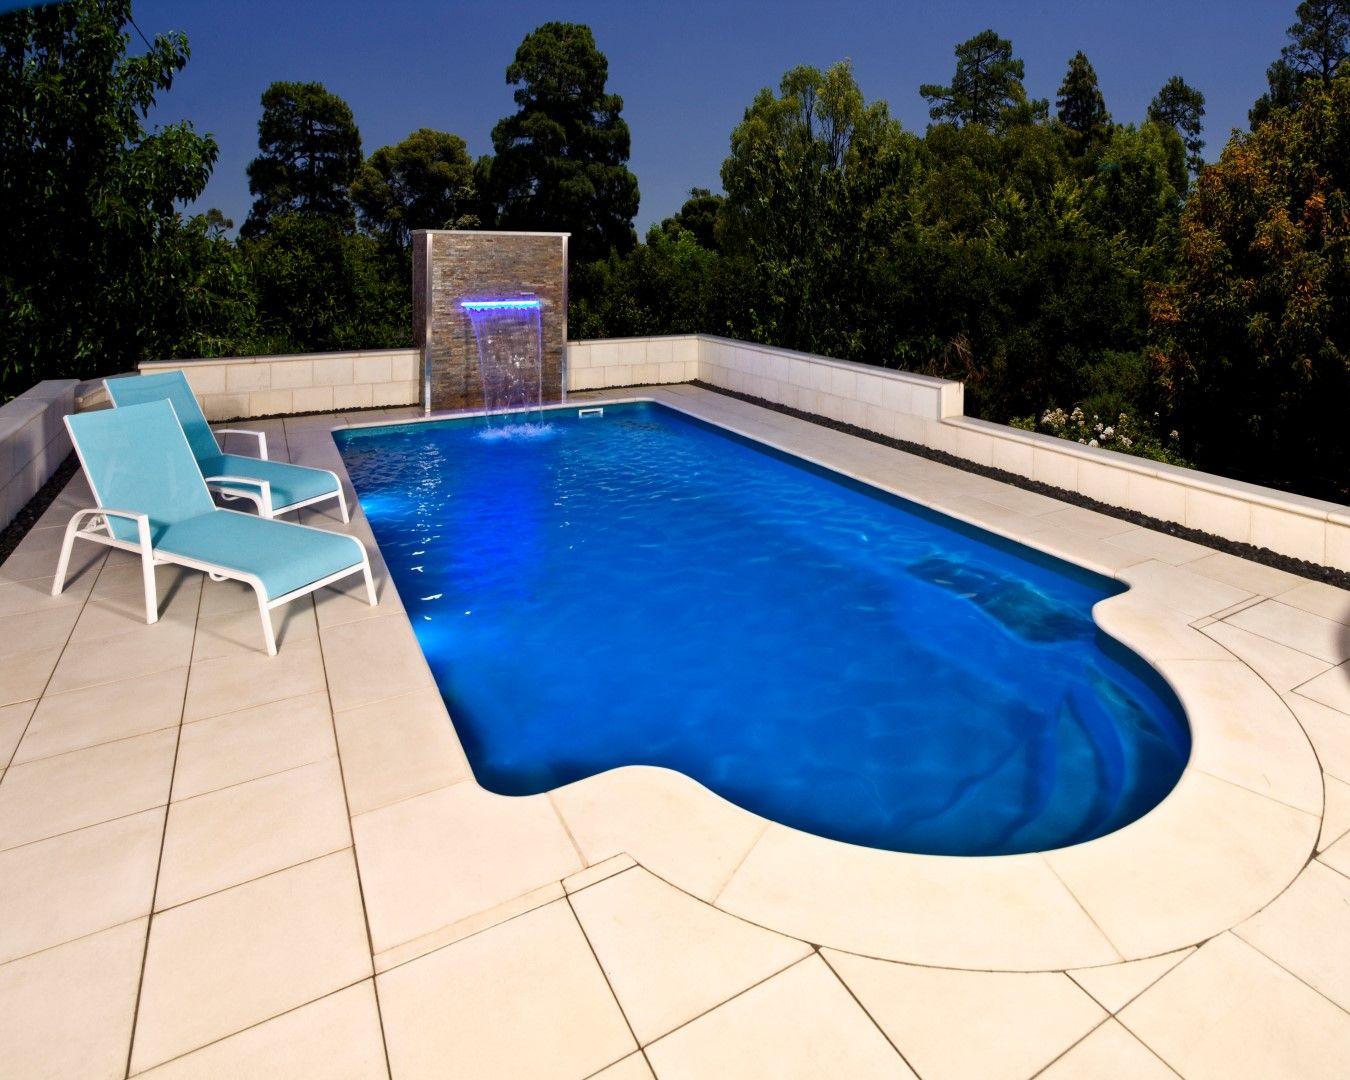 Photo Gallery Best Swimming Pools Freedom Pools Cool Swimming Pools Backyard Pool Designs Swimming Pools